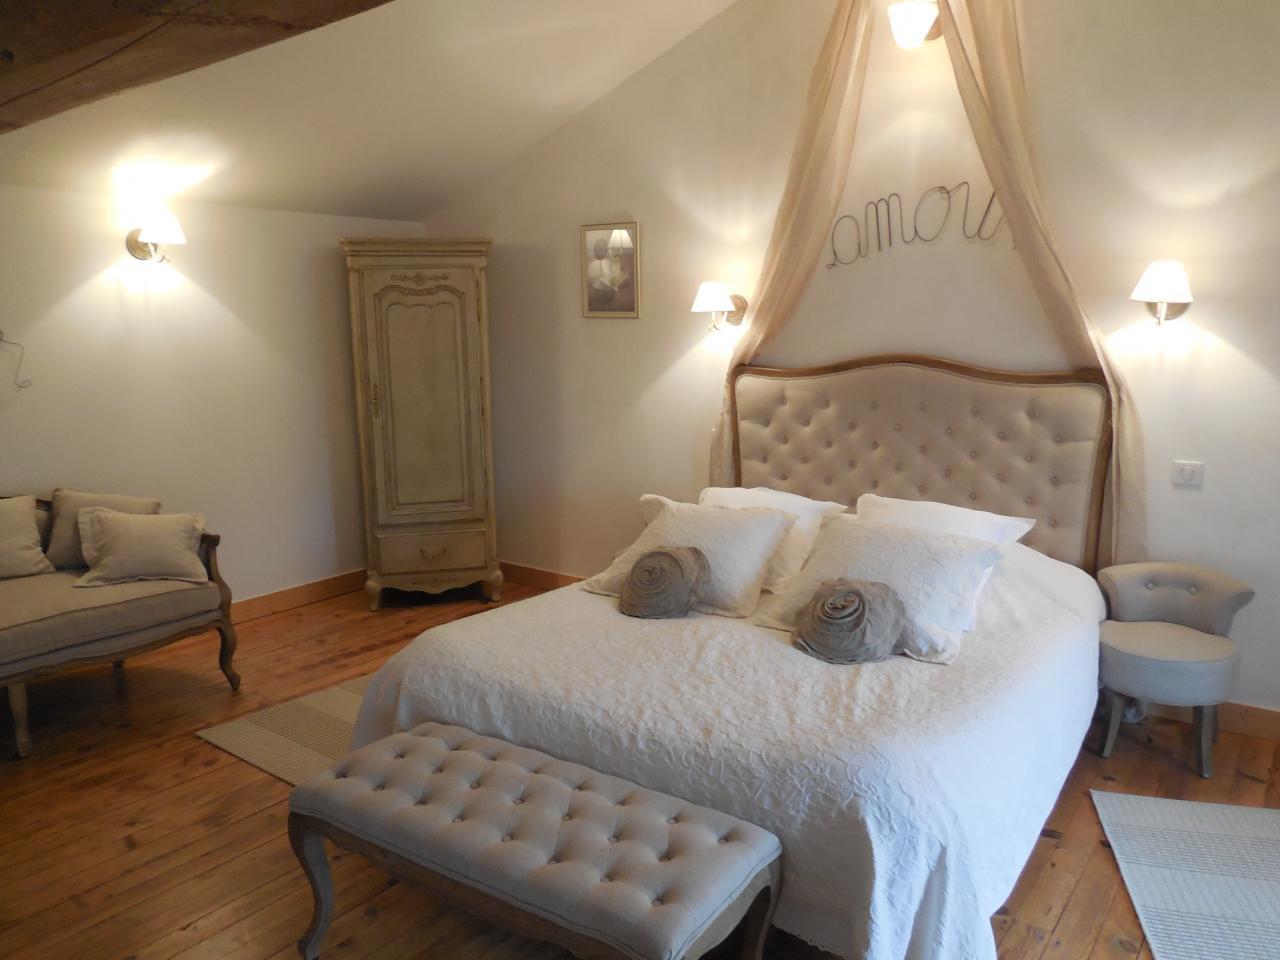 Chambre nuptiale et perle 2016 313 for Chambre nuptiale